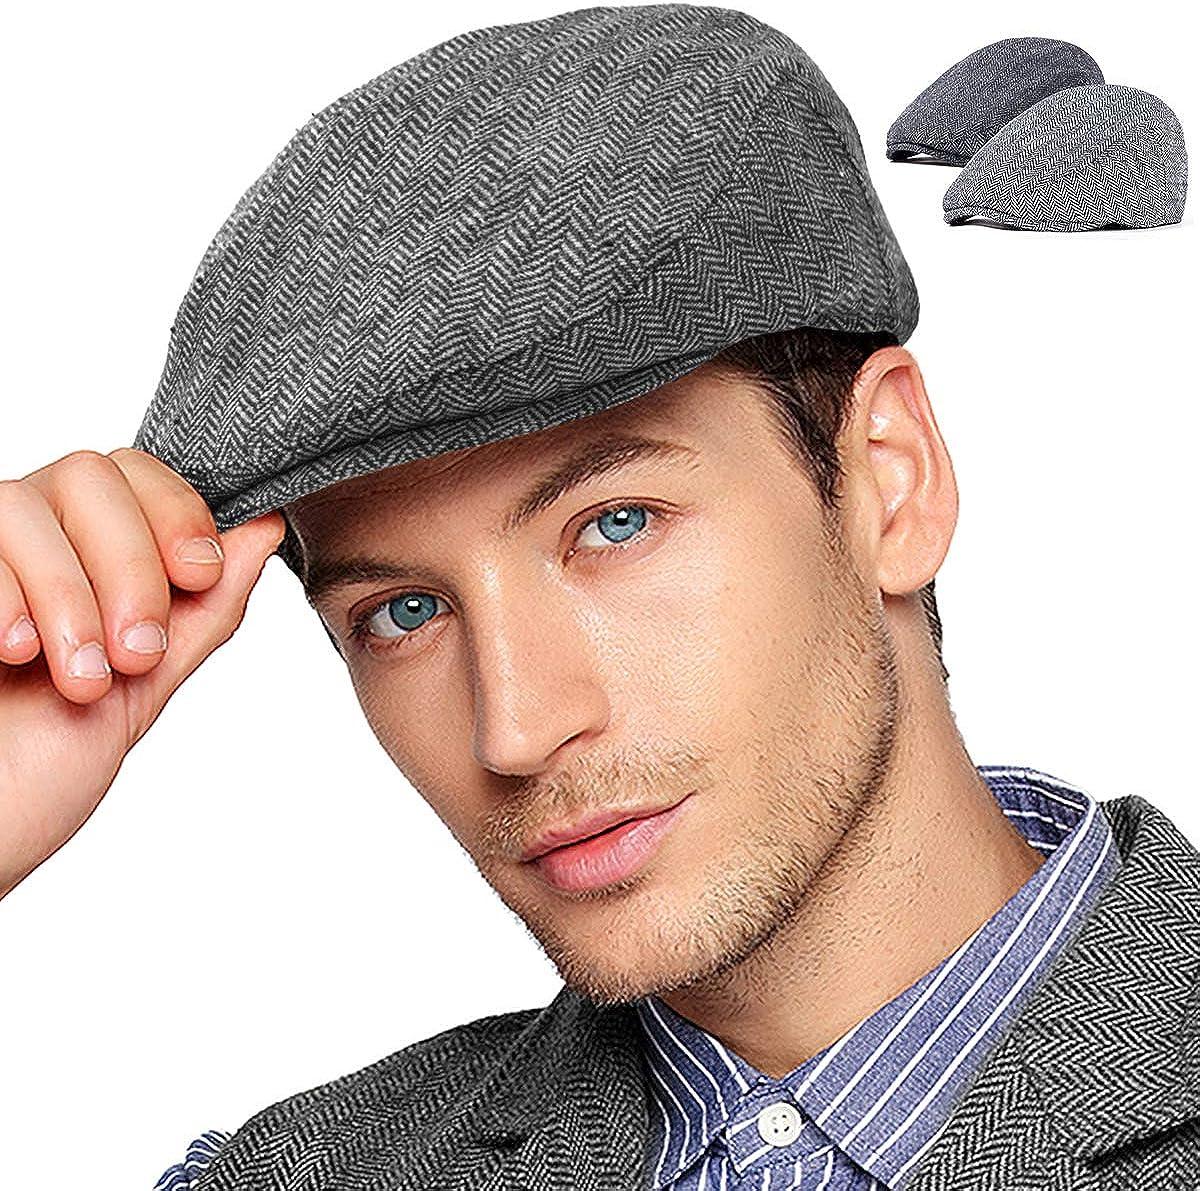 2Pack Adjustable Newsboy Hats for Men Flat Cap Mens Irish Cabbie Gatsby  Tweed Ivy at Amazon Men's Clothing store